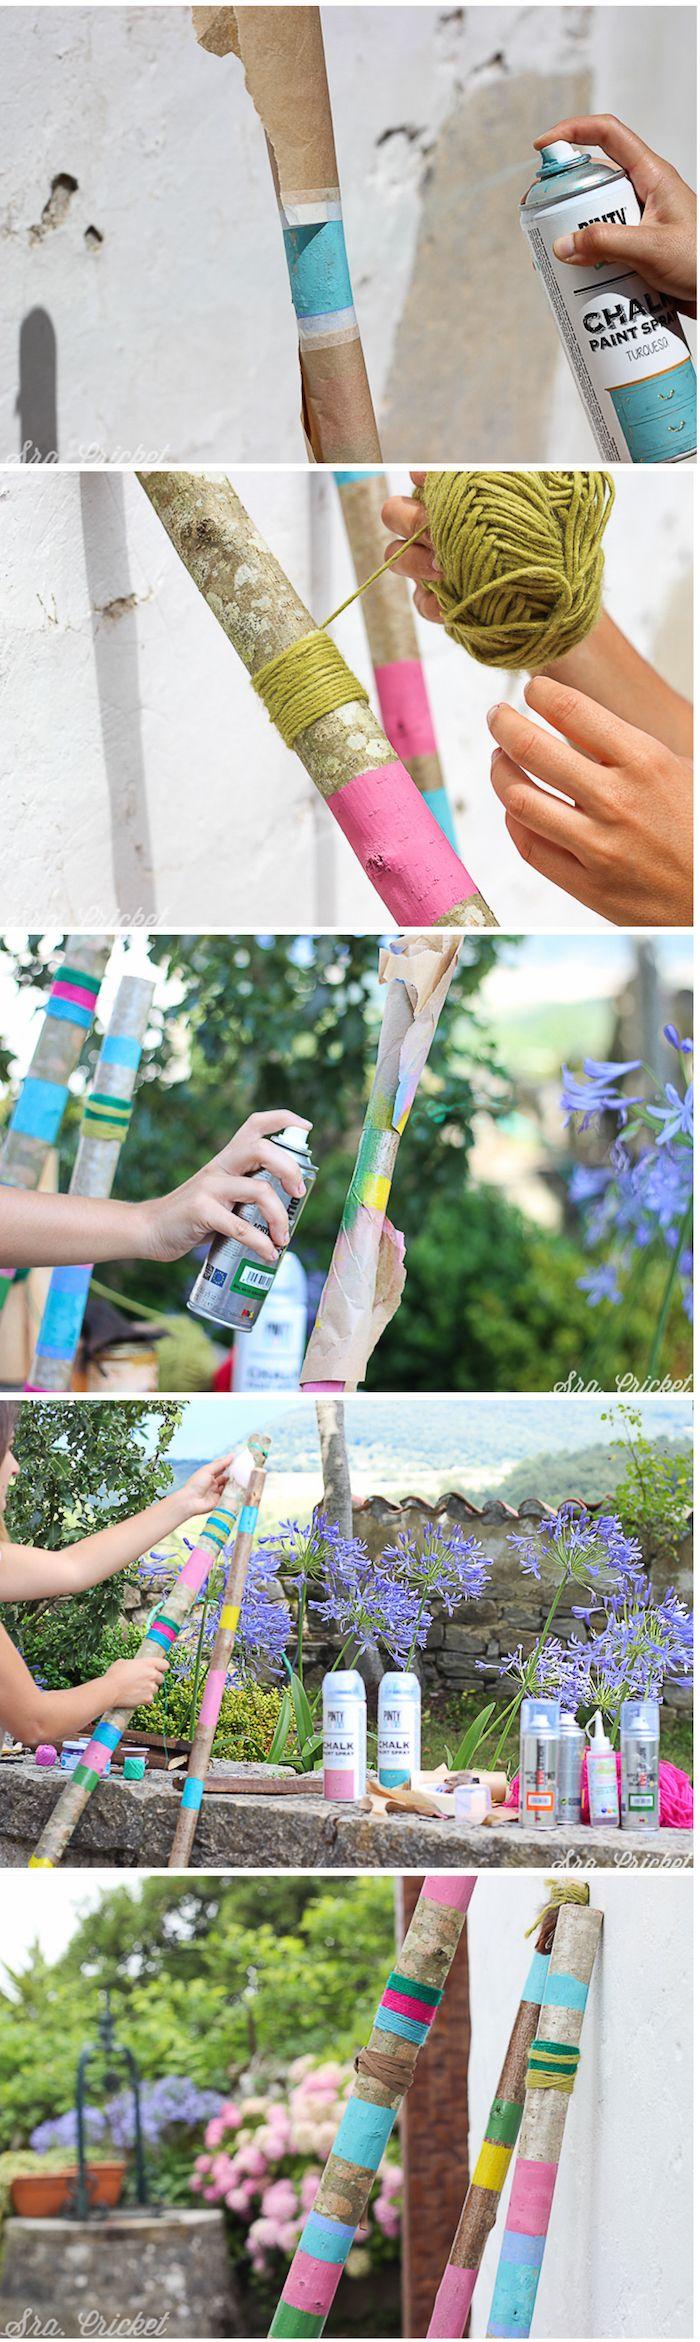 tutorial palos decorativos estilo boho